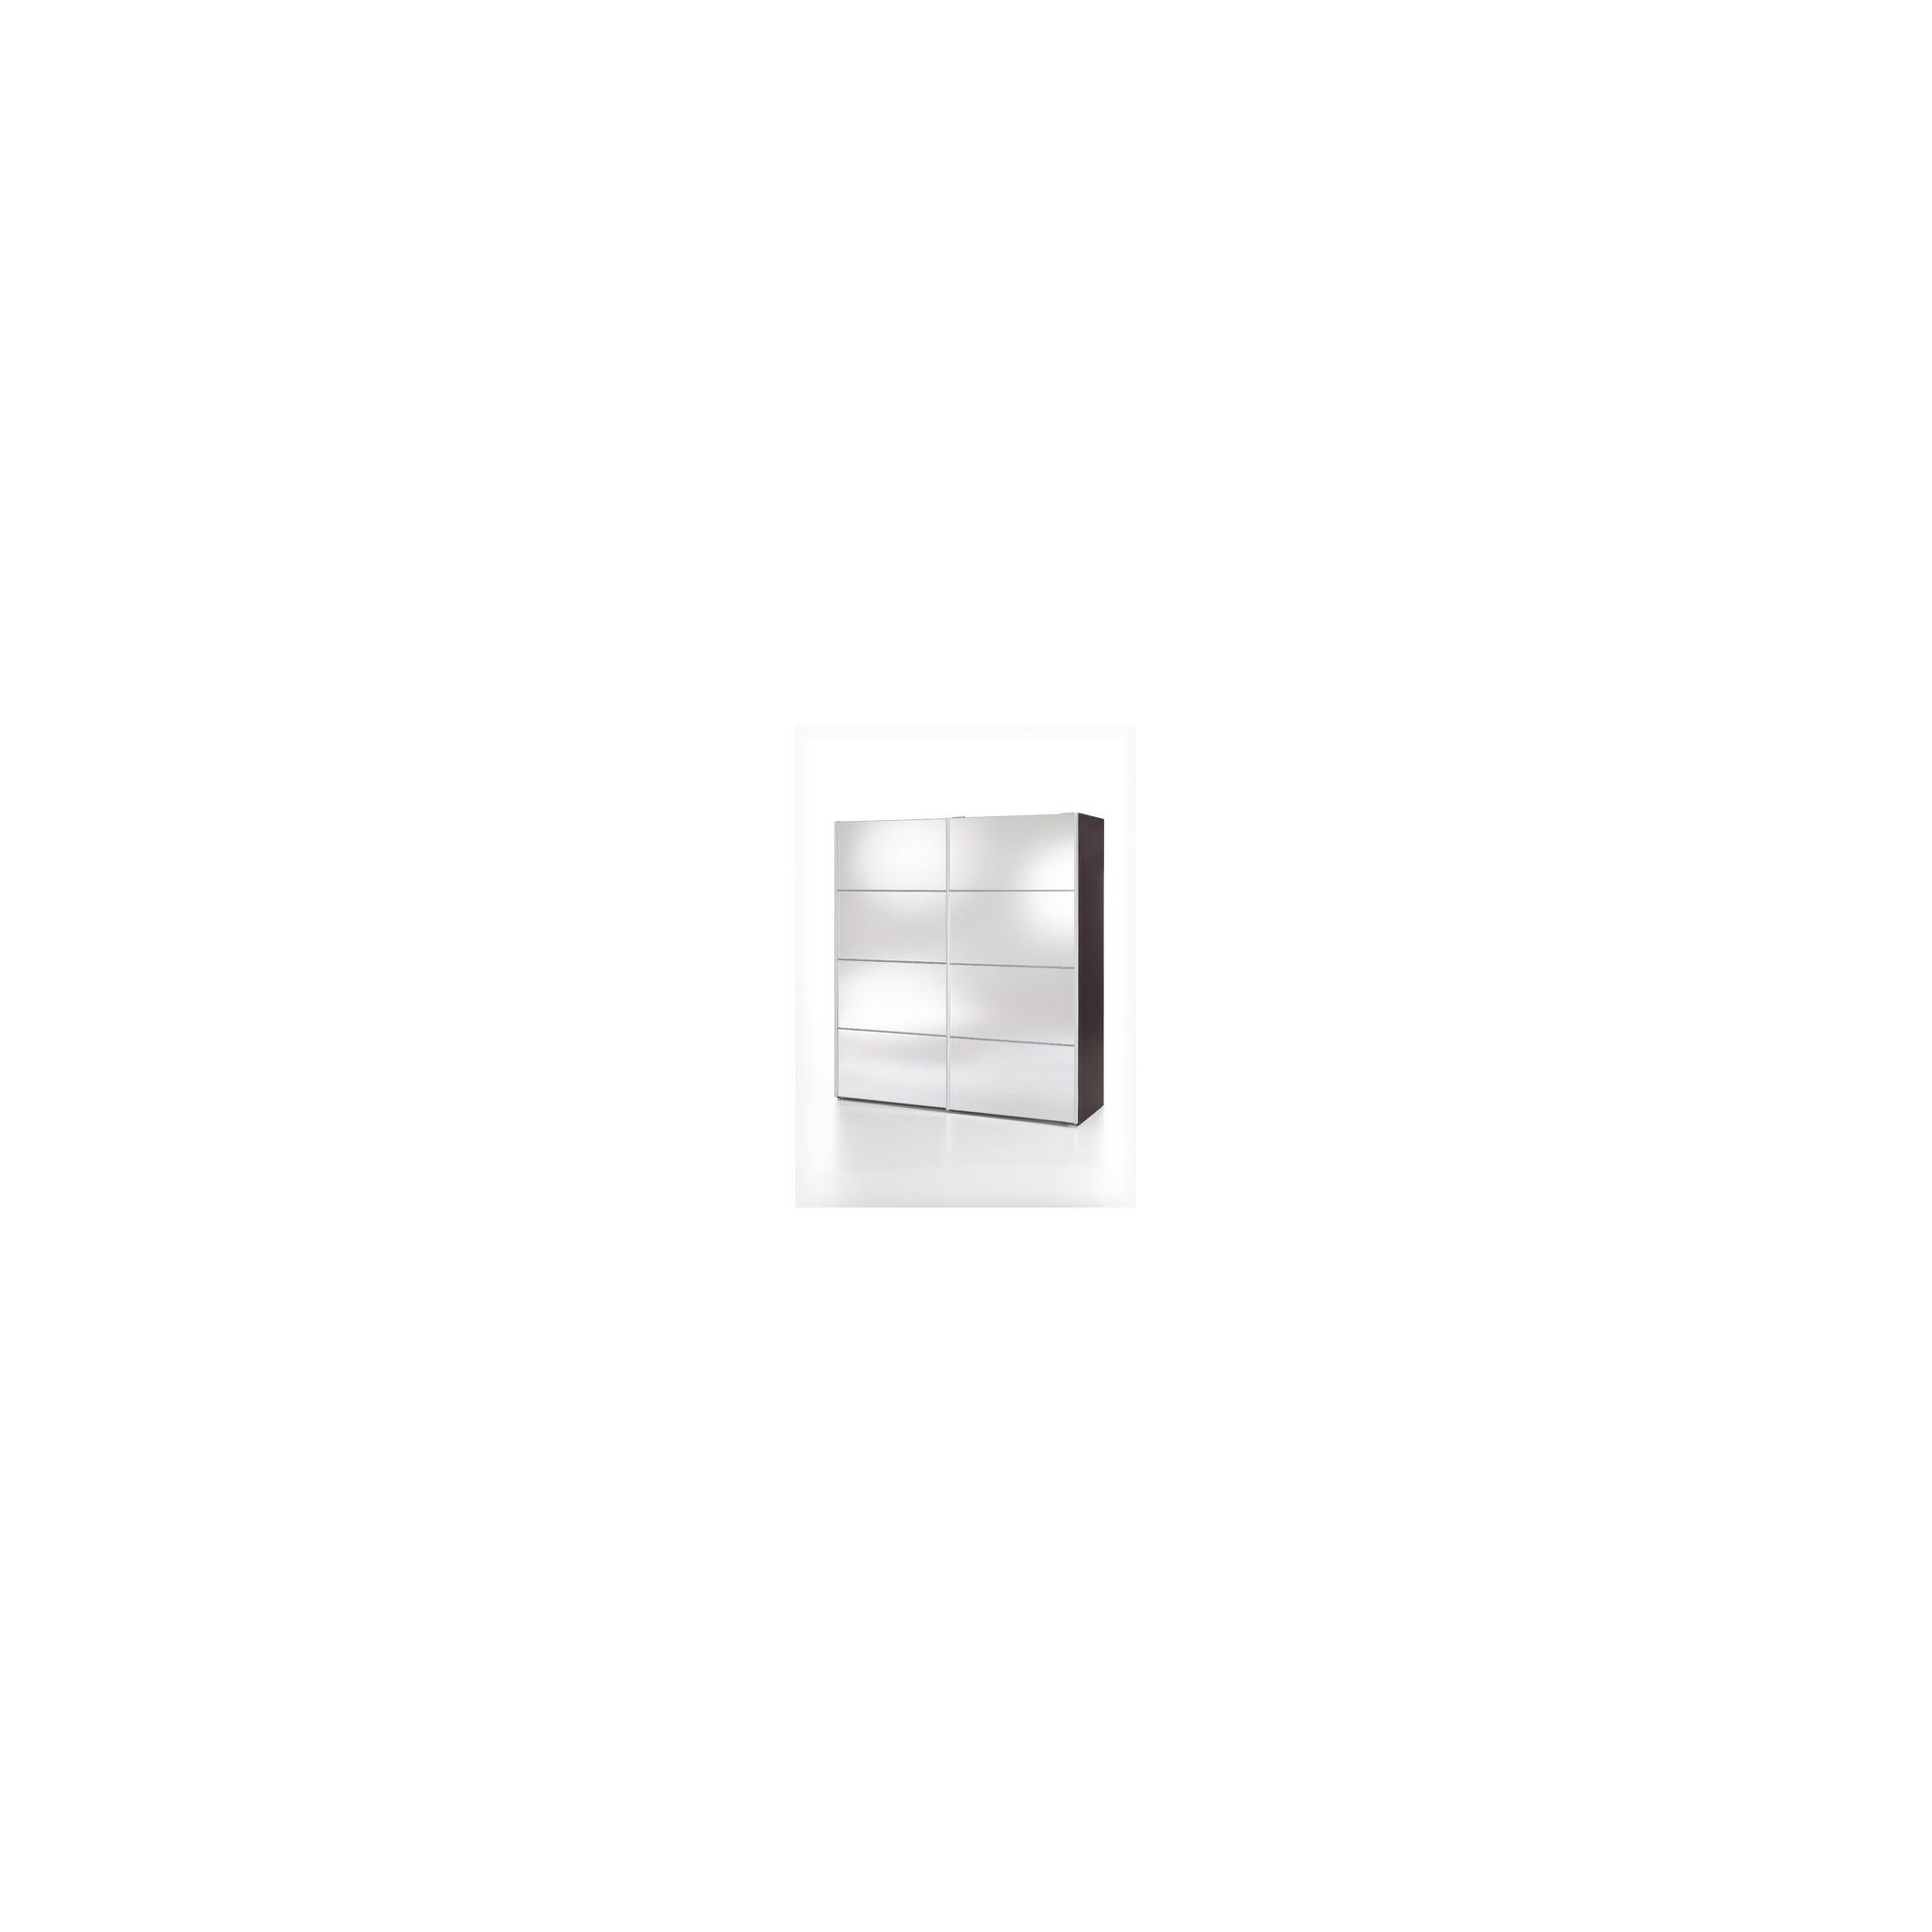 Tvilum Verona Sliding Mirrored Wardrobe - Plum at Tesco Direct